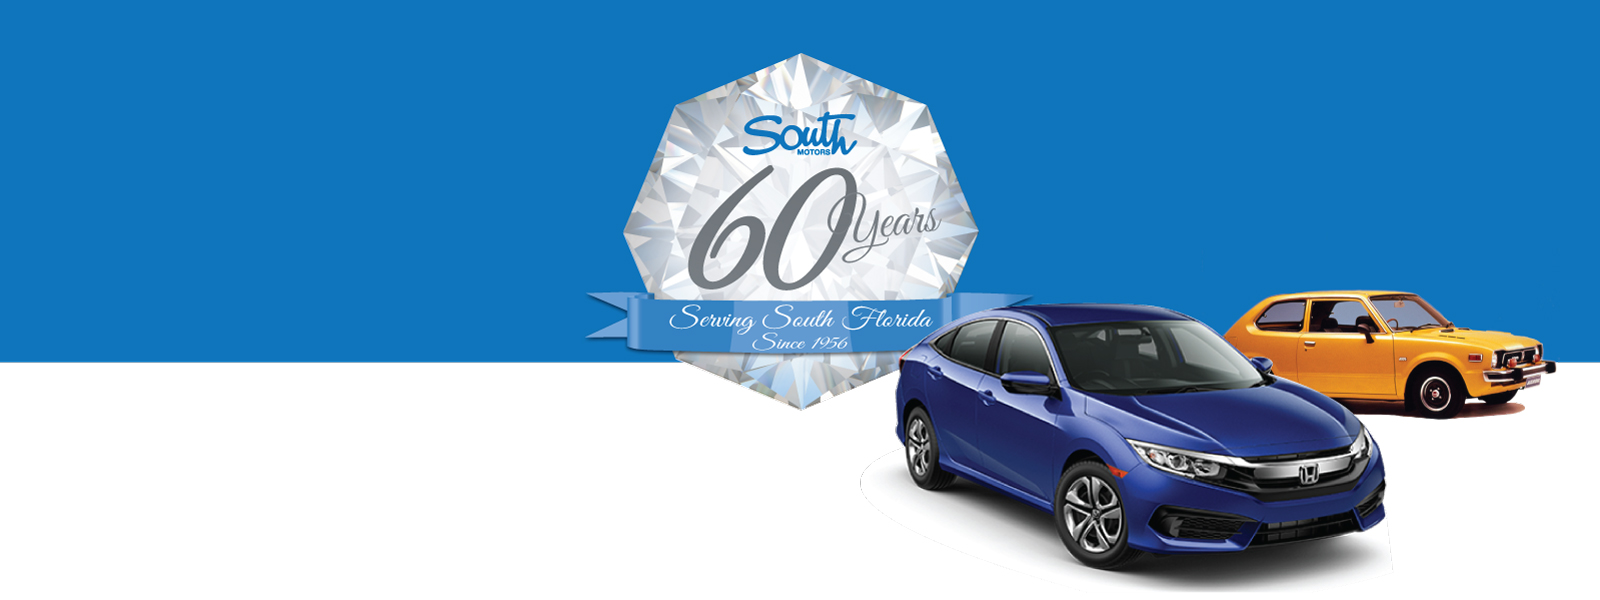 About south motors honda a miami fl dealership for South motors honda miami